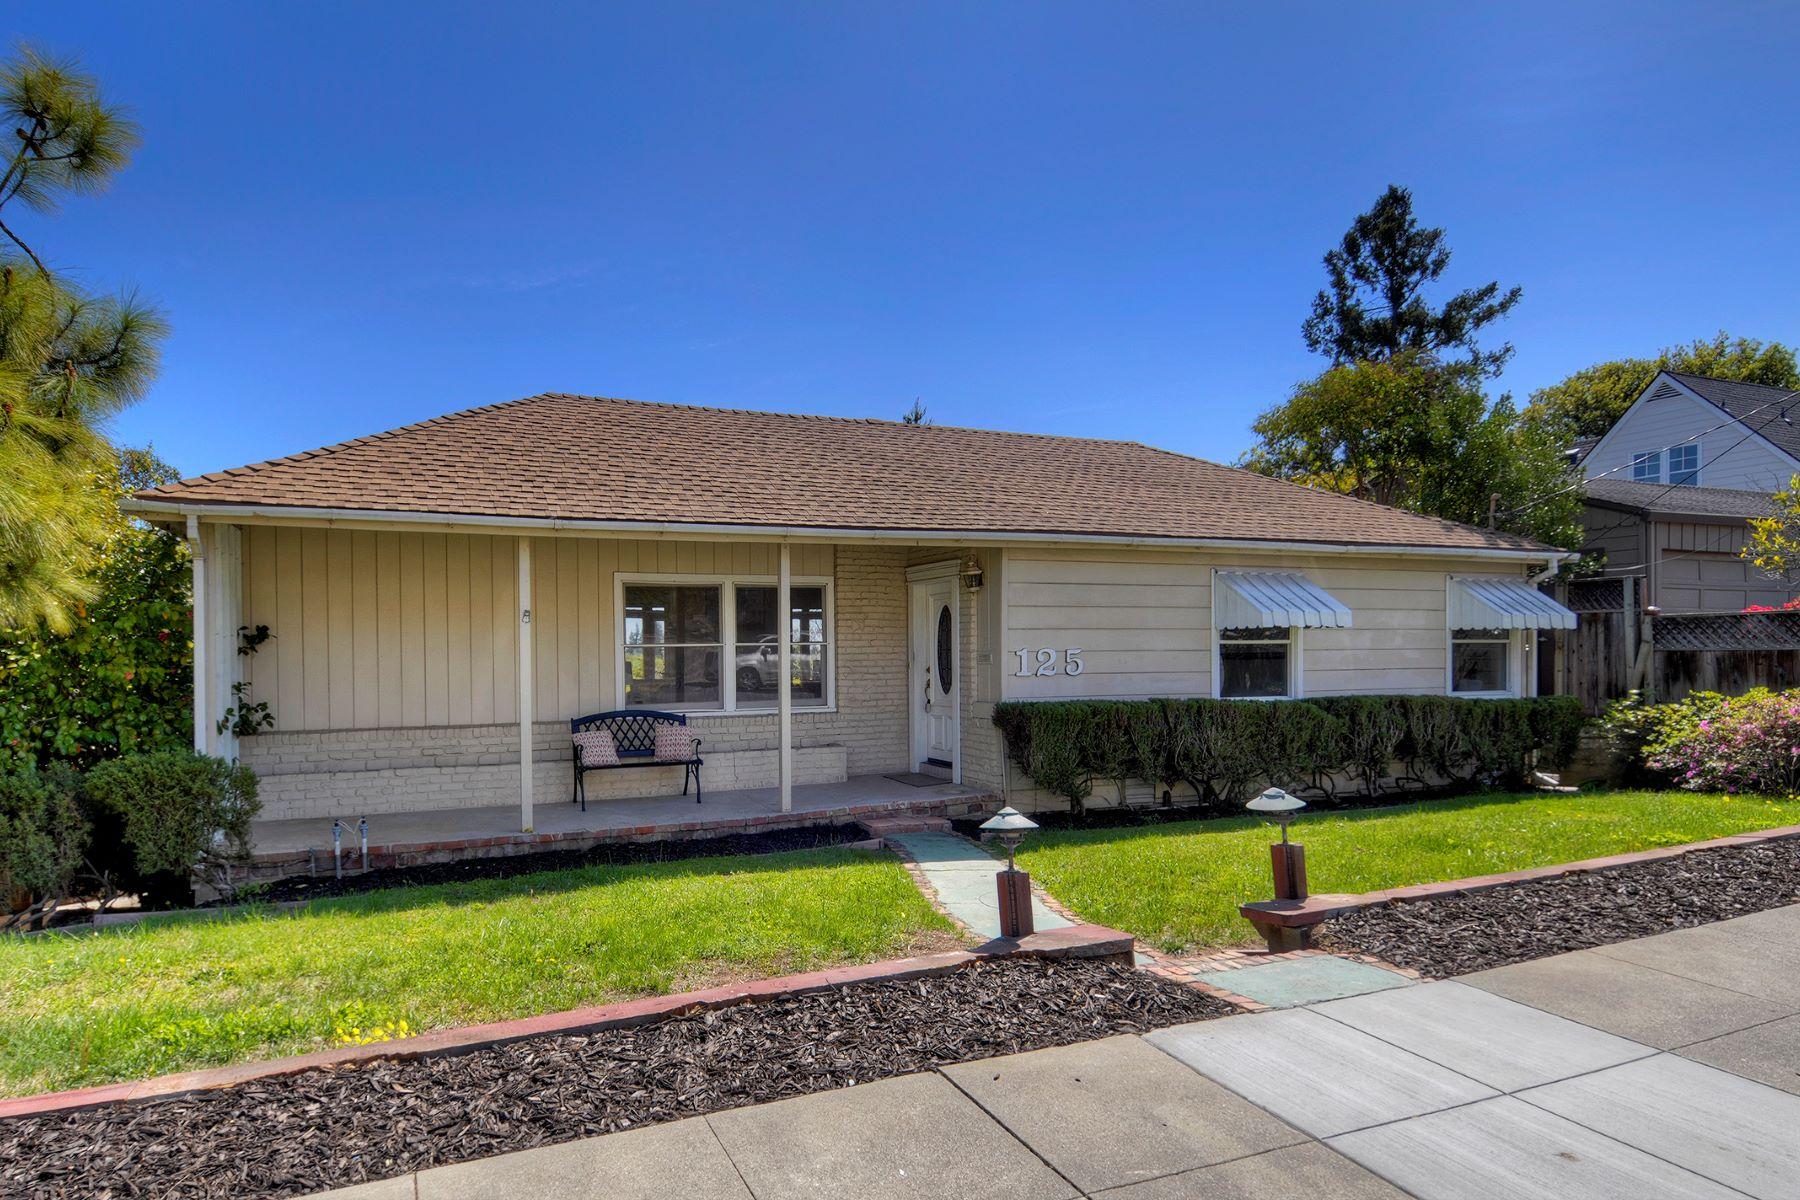 Single Family Homes for Sale at Delightful Home in Desirable White Oaks Neighborhood 125 Garnet Avenue San Carlos, California 94070 United States